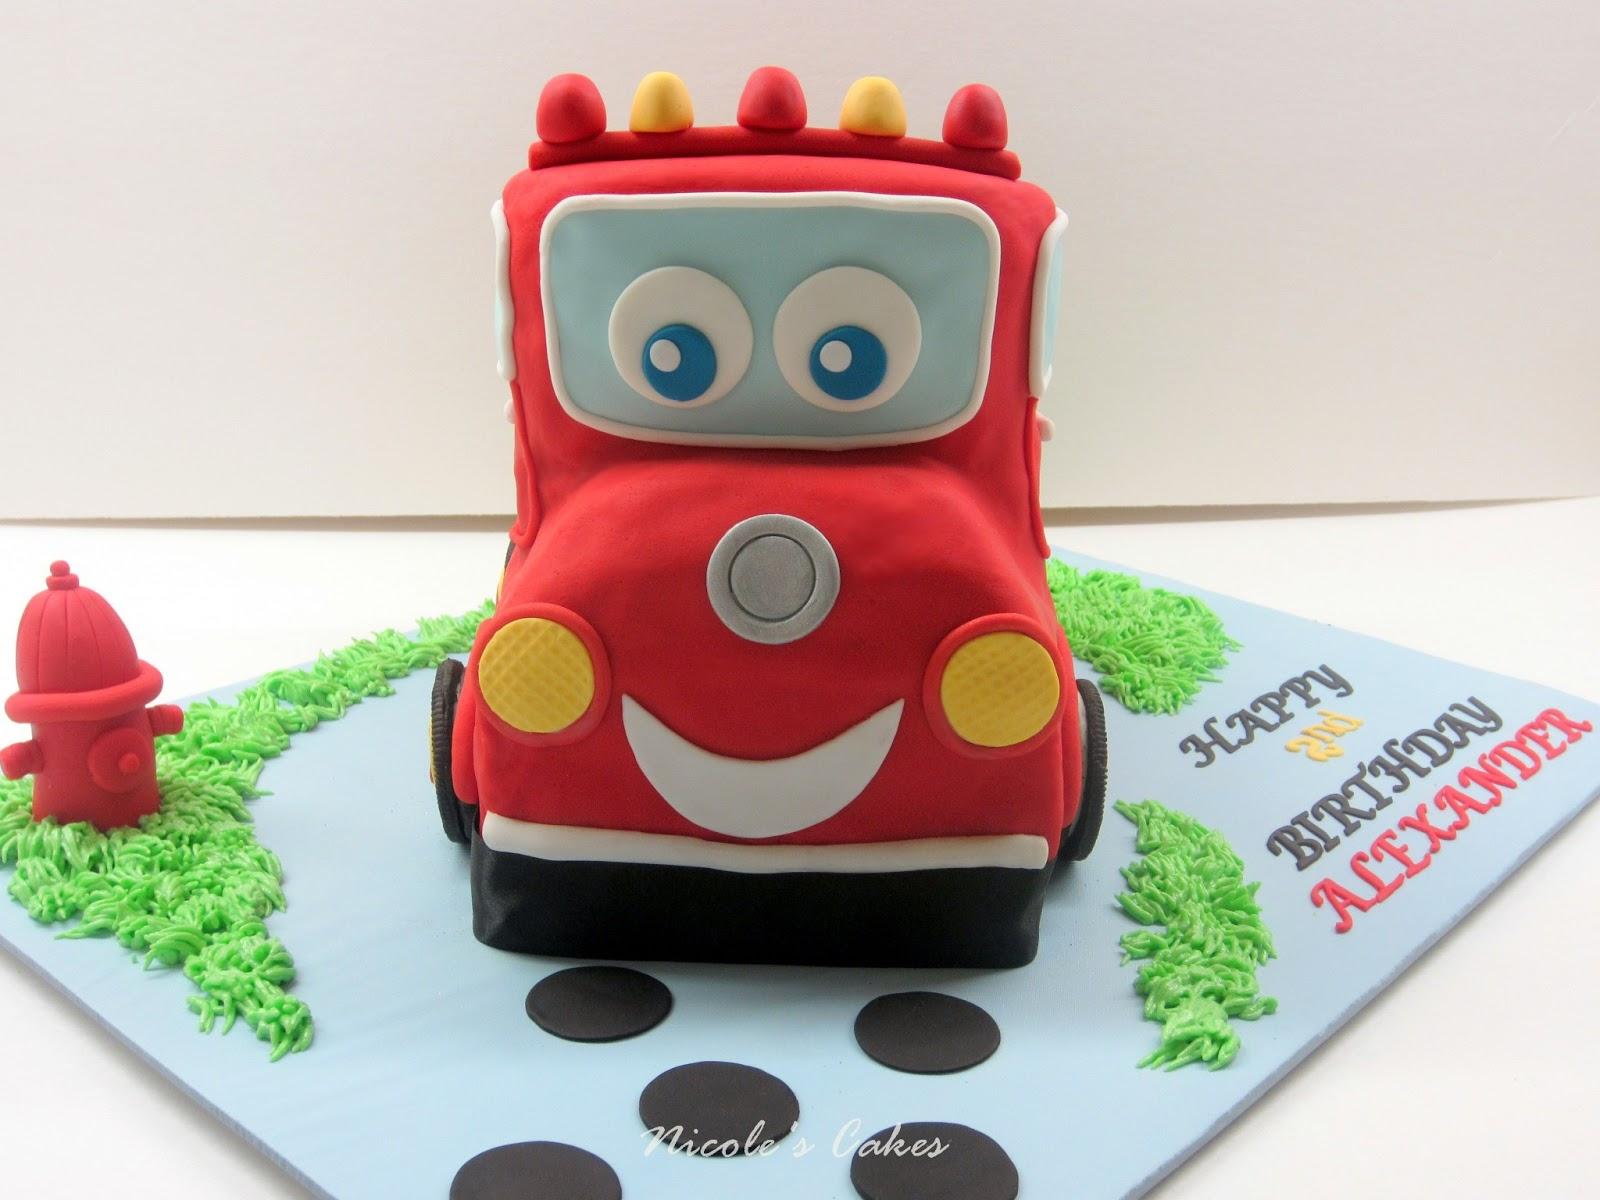 On Birthday Cakes 3 D Toy Firetruck Cake